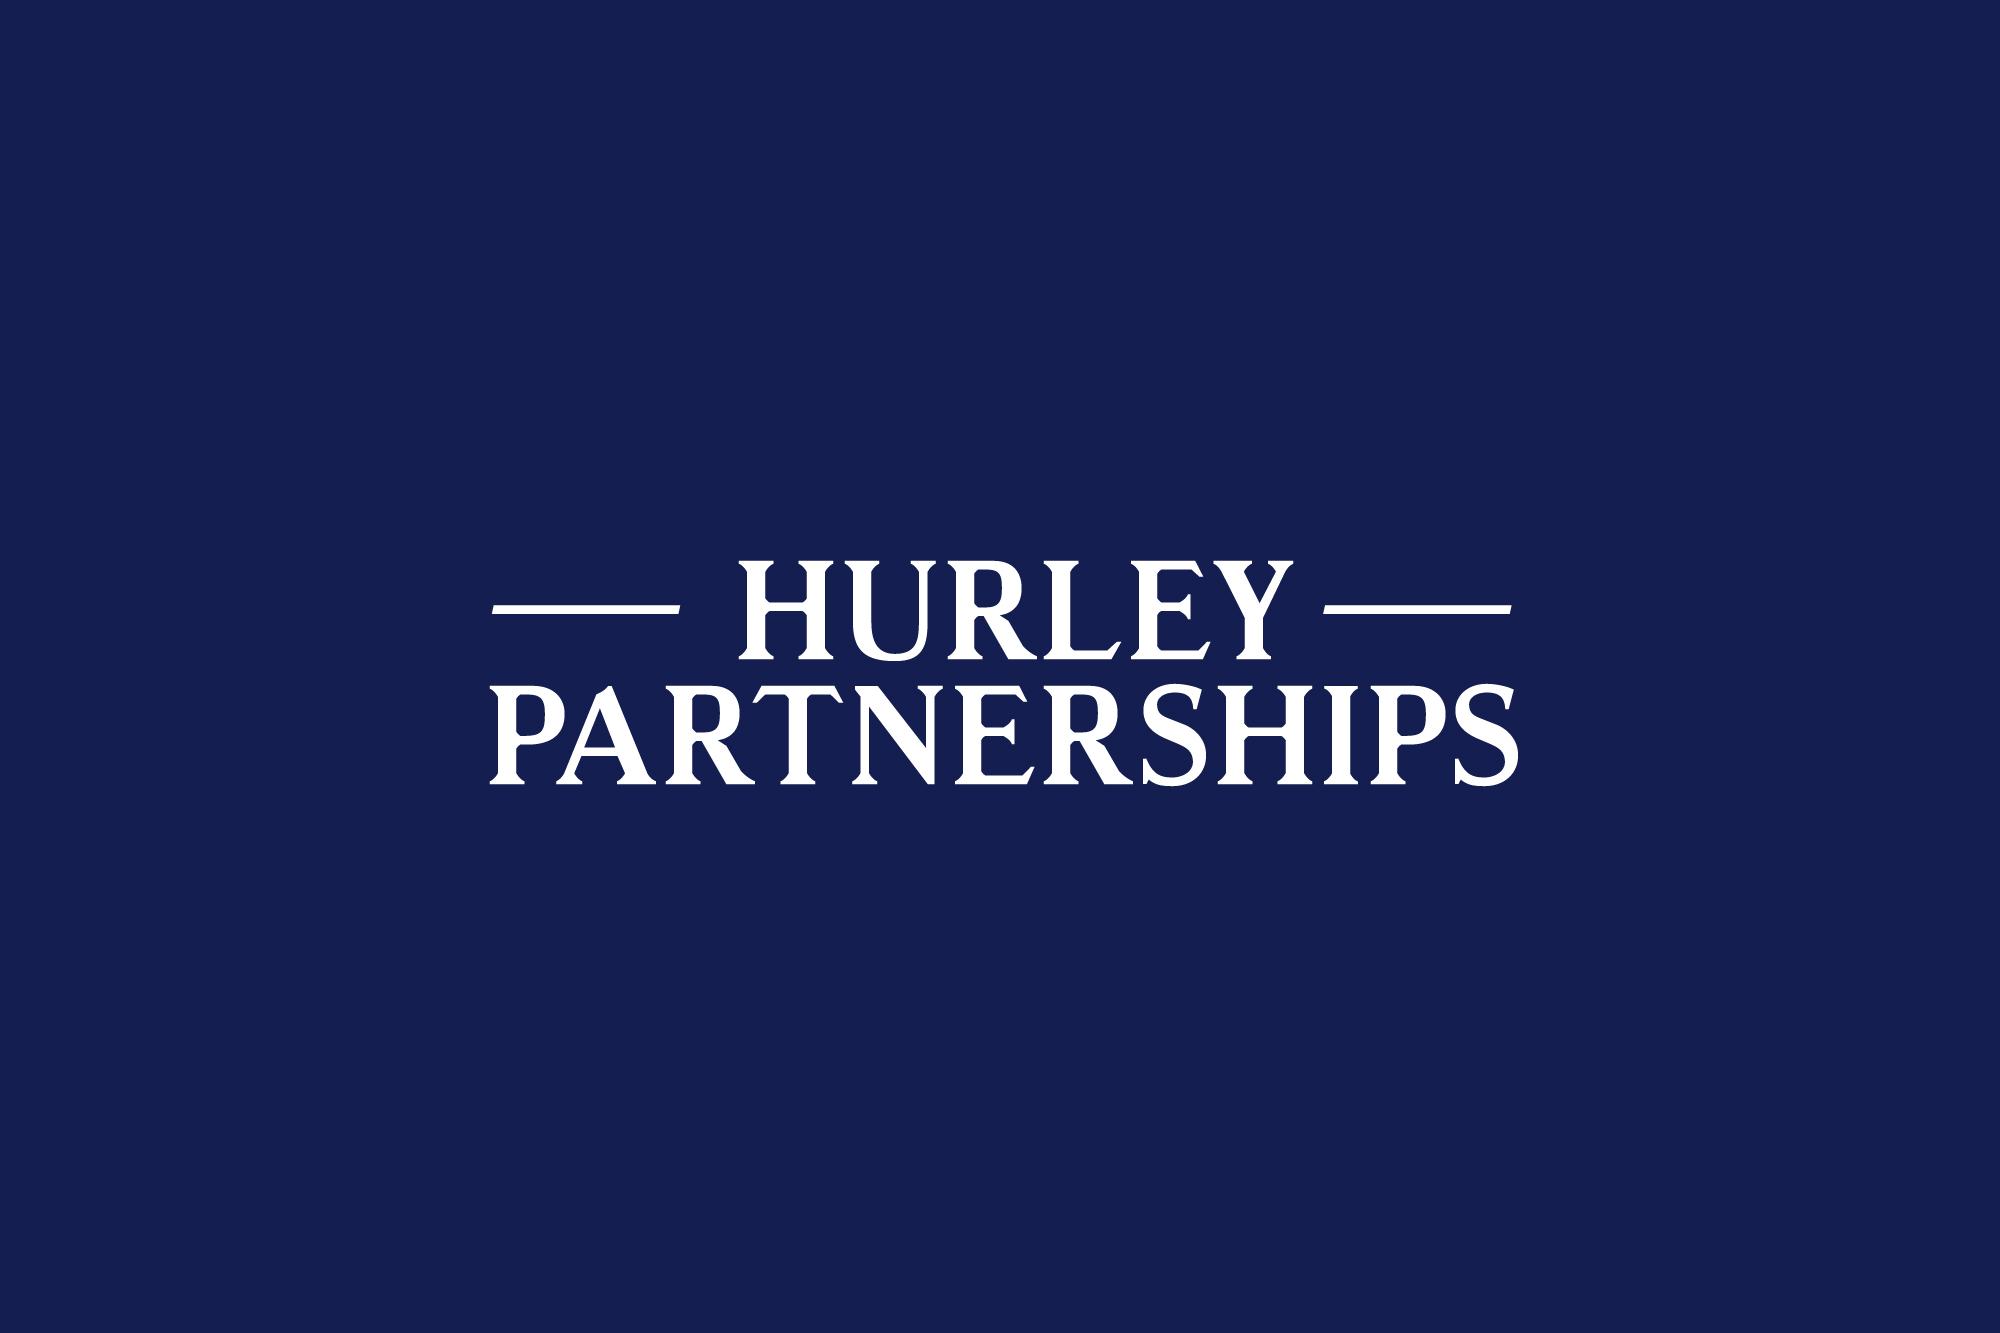 Hurley_Partnerships_Website_080420_3